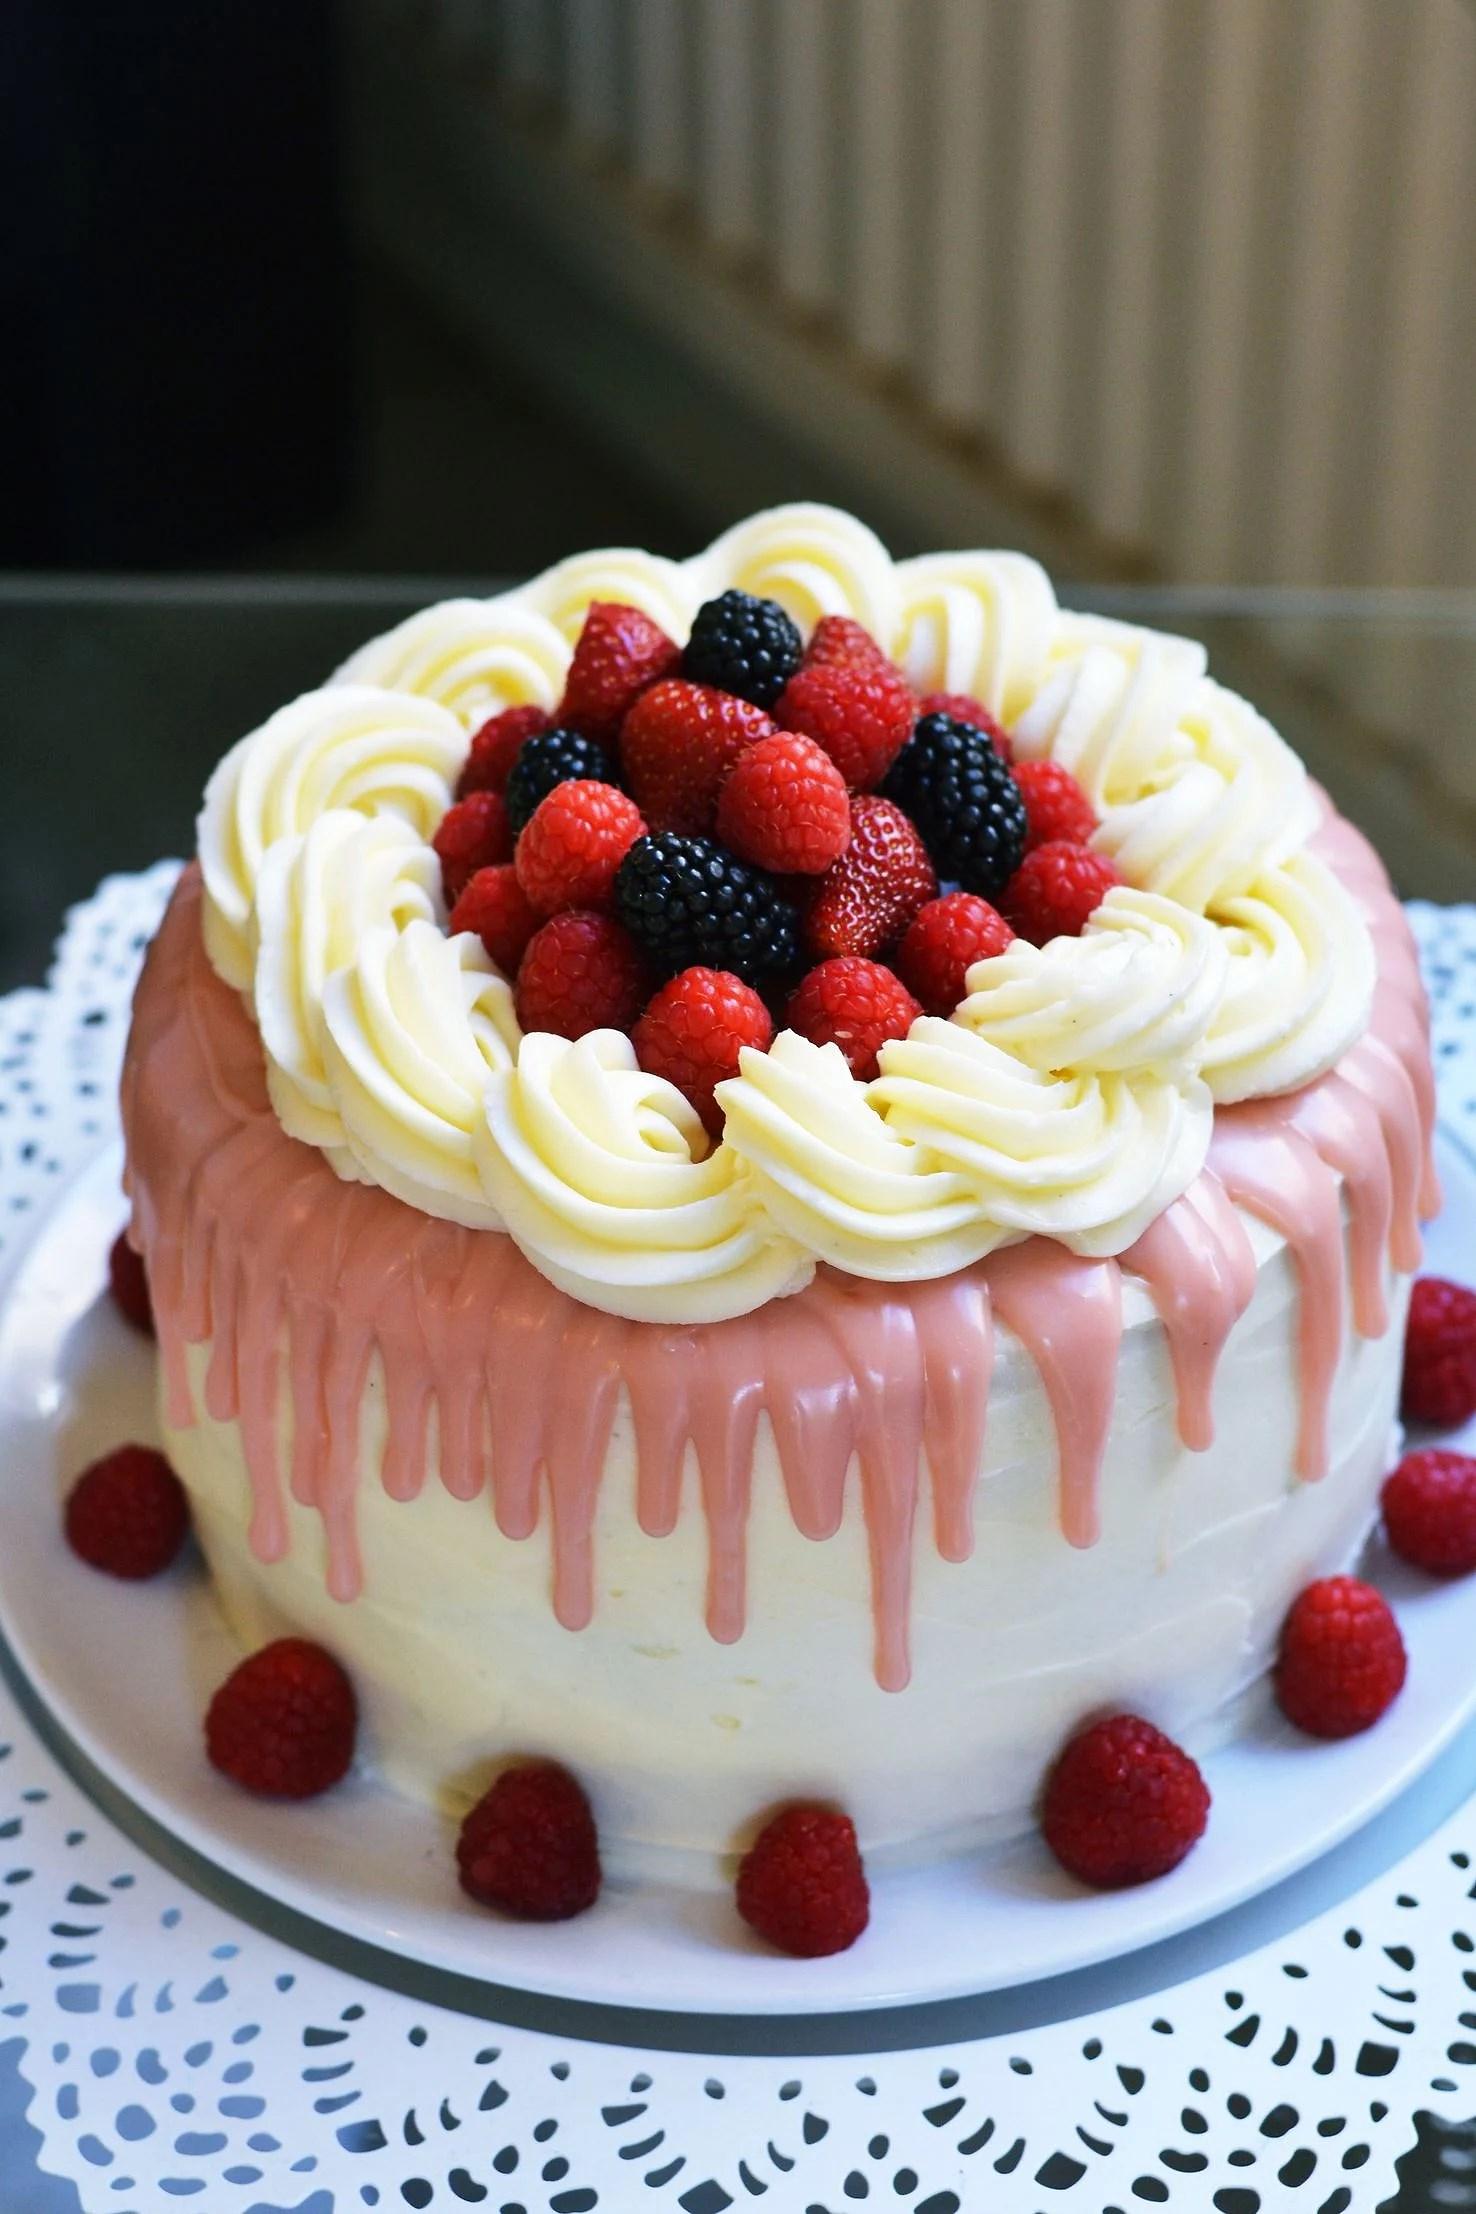 Summer Berries Cake